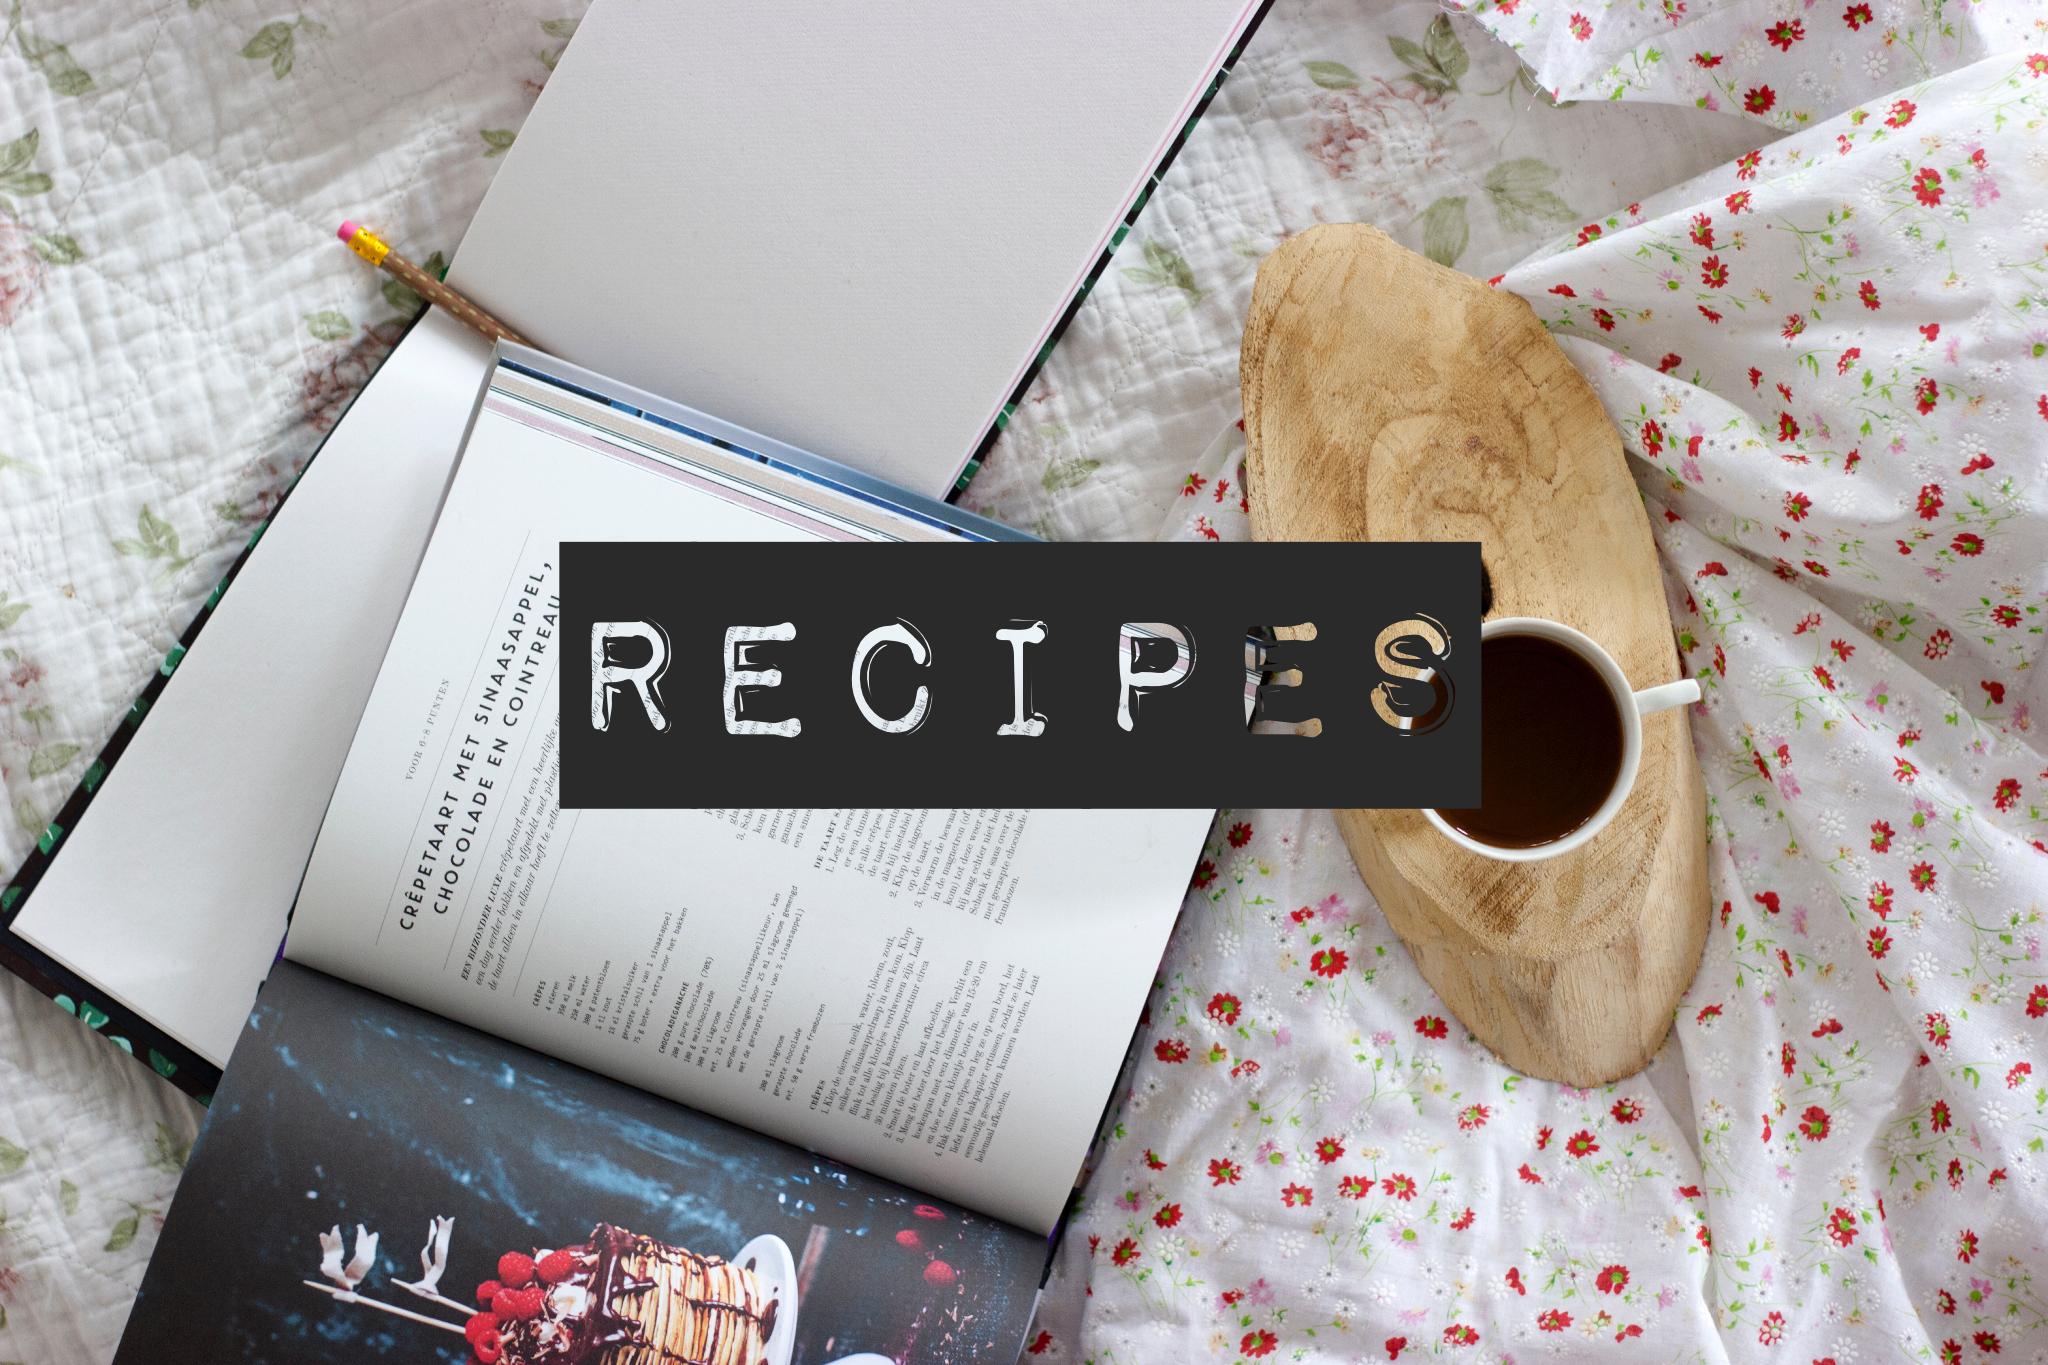 Recipes | Home of the Croslands